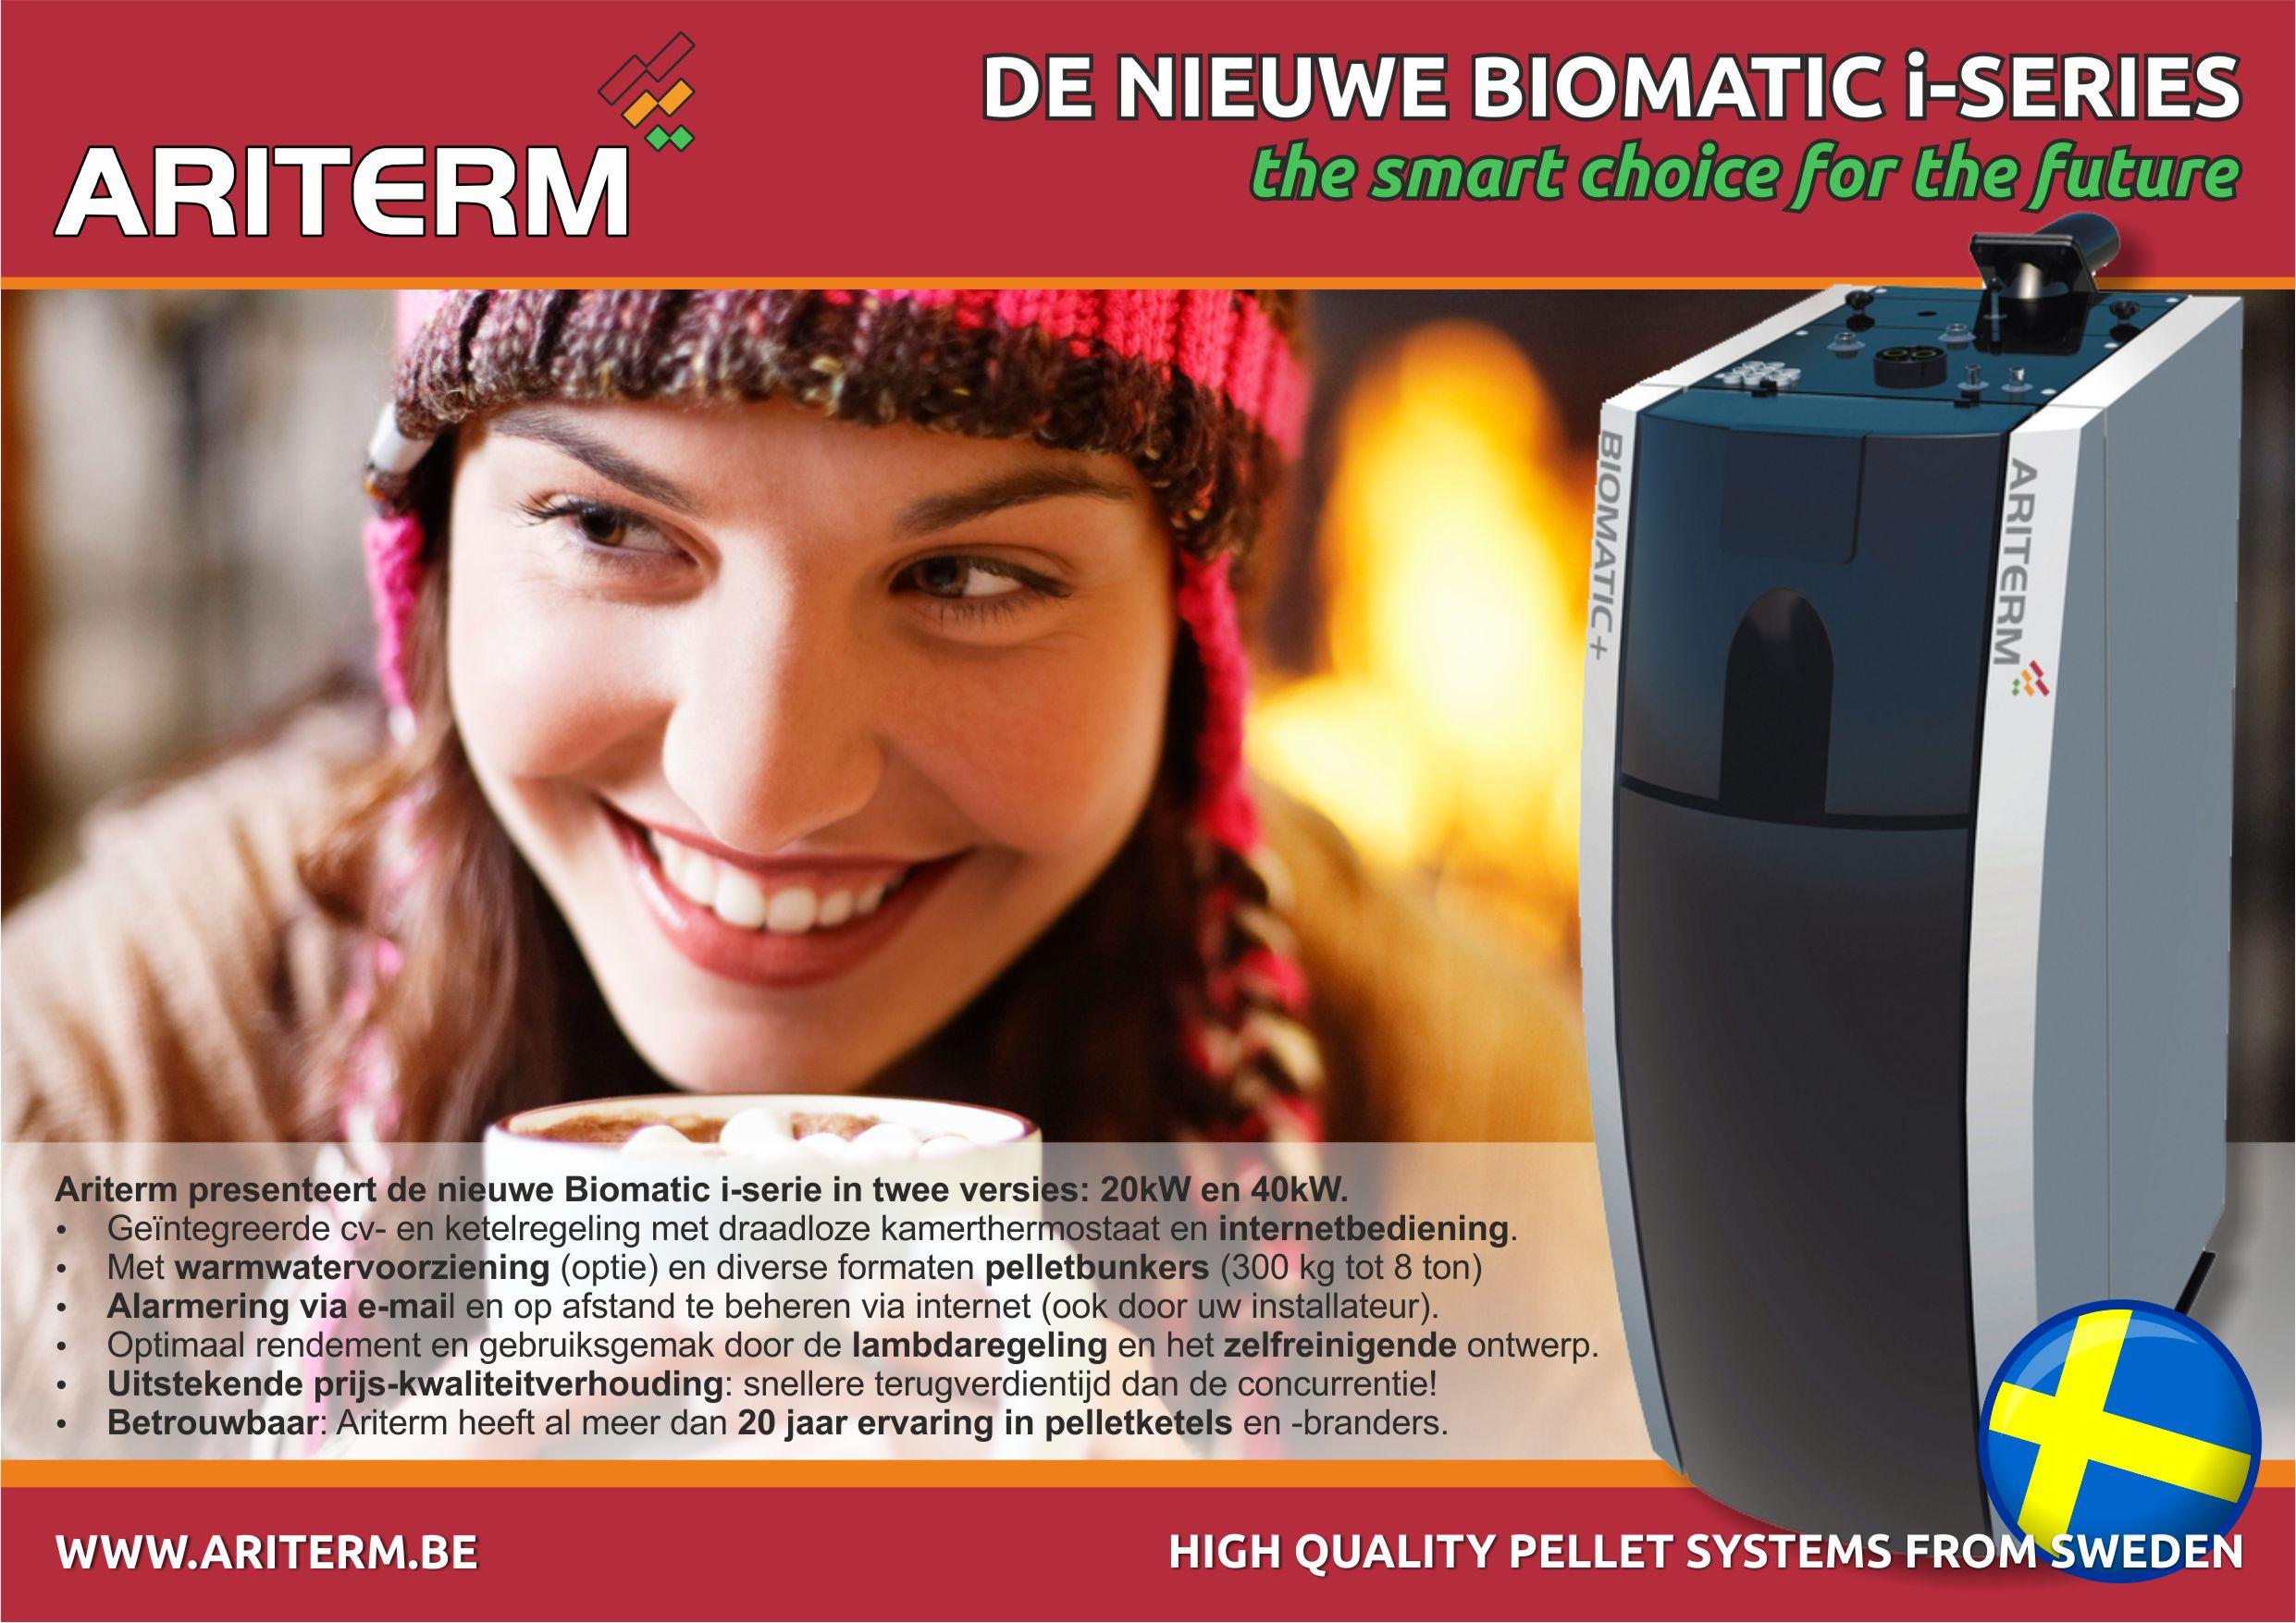 advertentie pelletketel Ariterm pelletverwarming pellet CV Biomatic